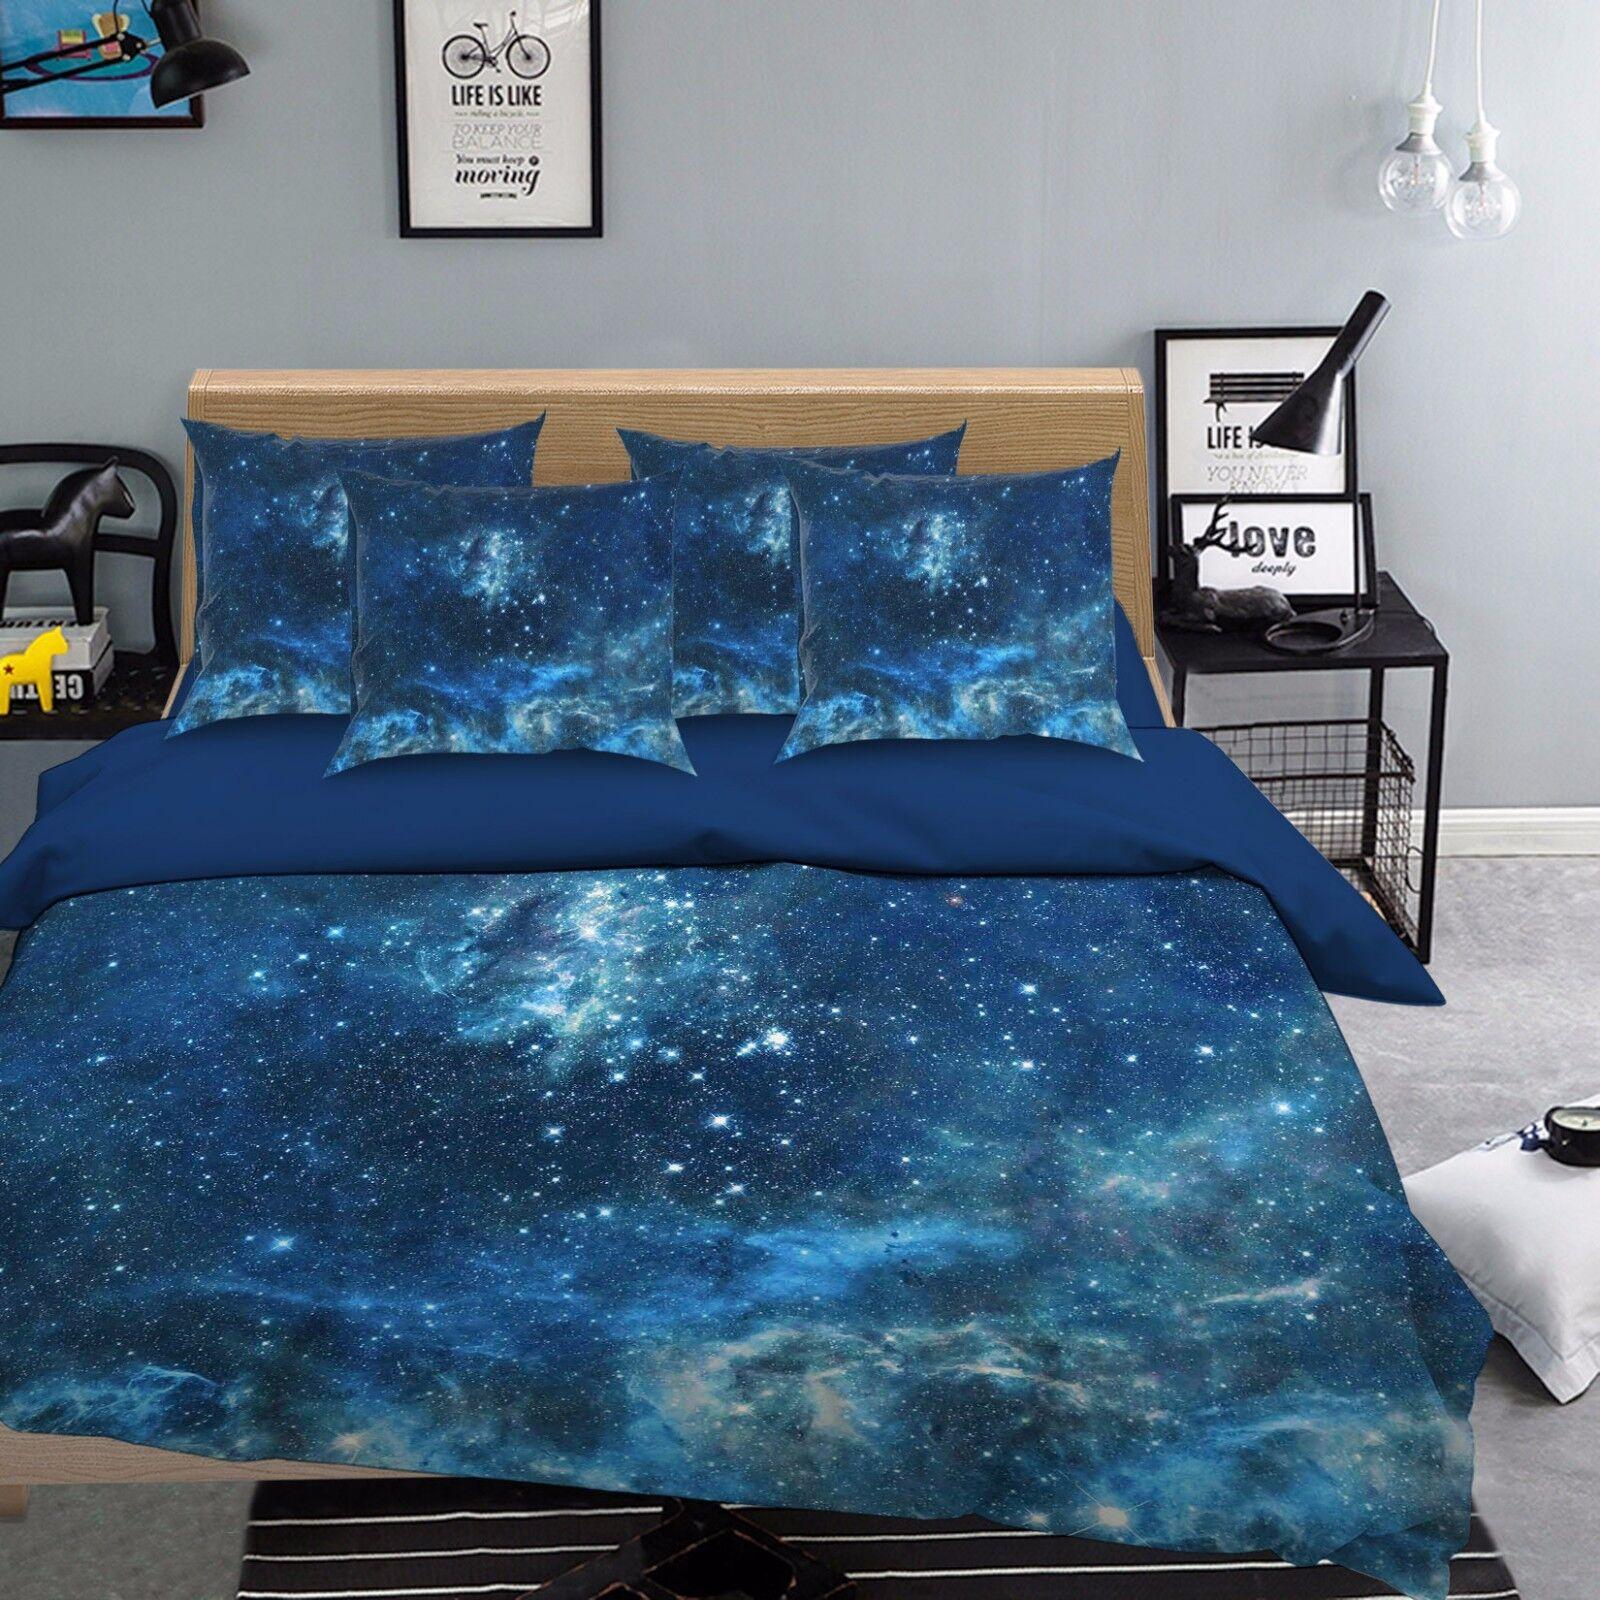 3D Bright Starry Sky 5211 Bed Pillowcases Quilt Duvet Cover Set Single Queen CA